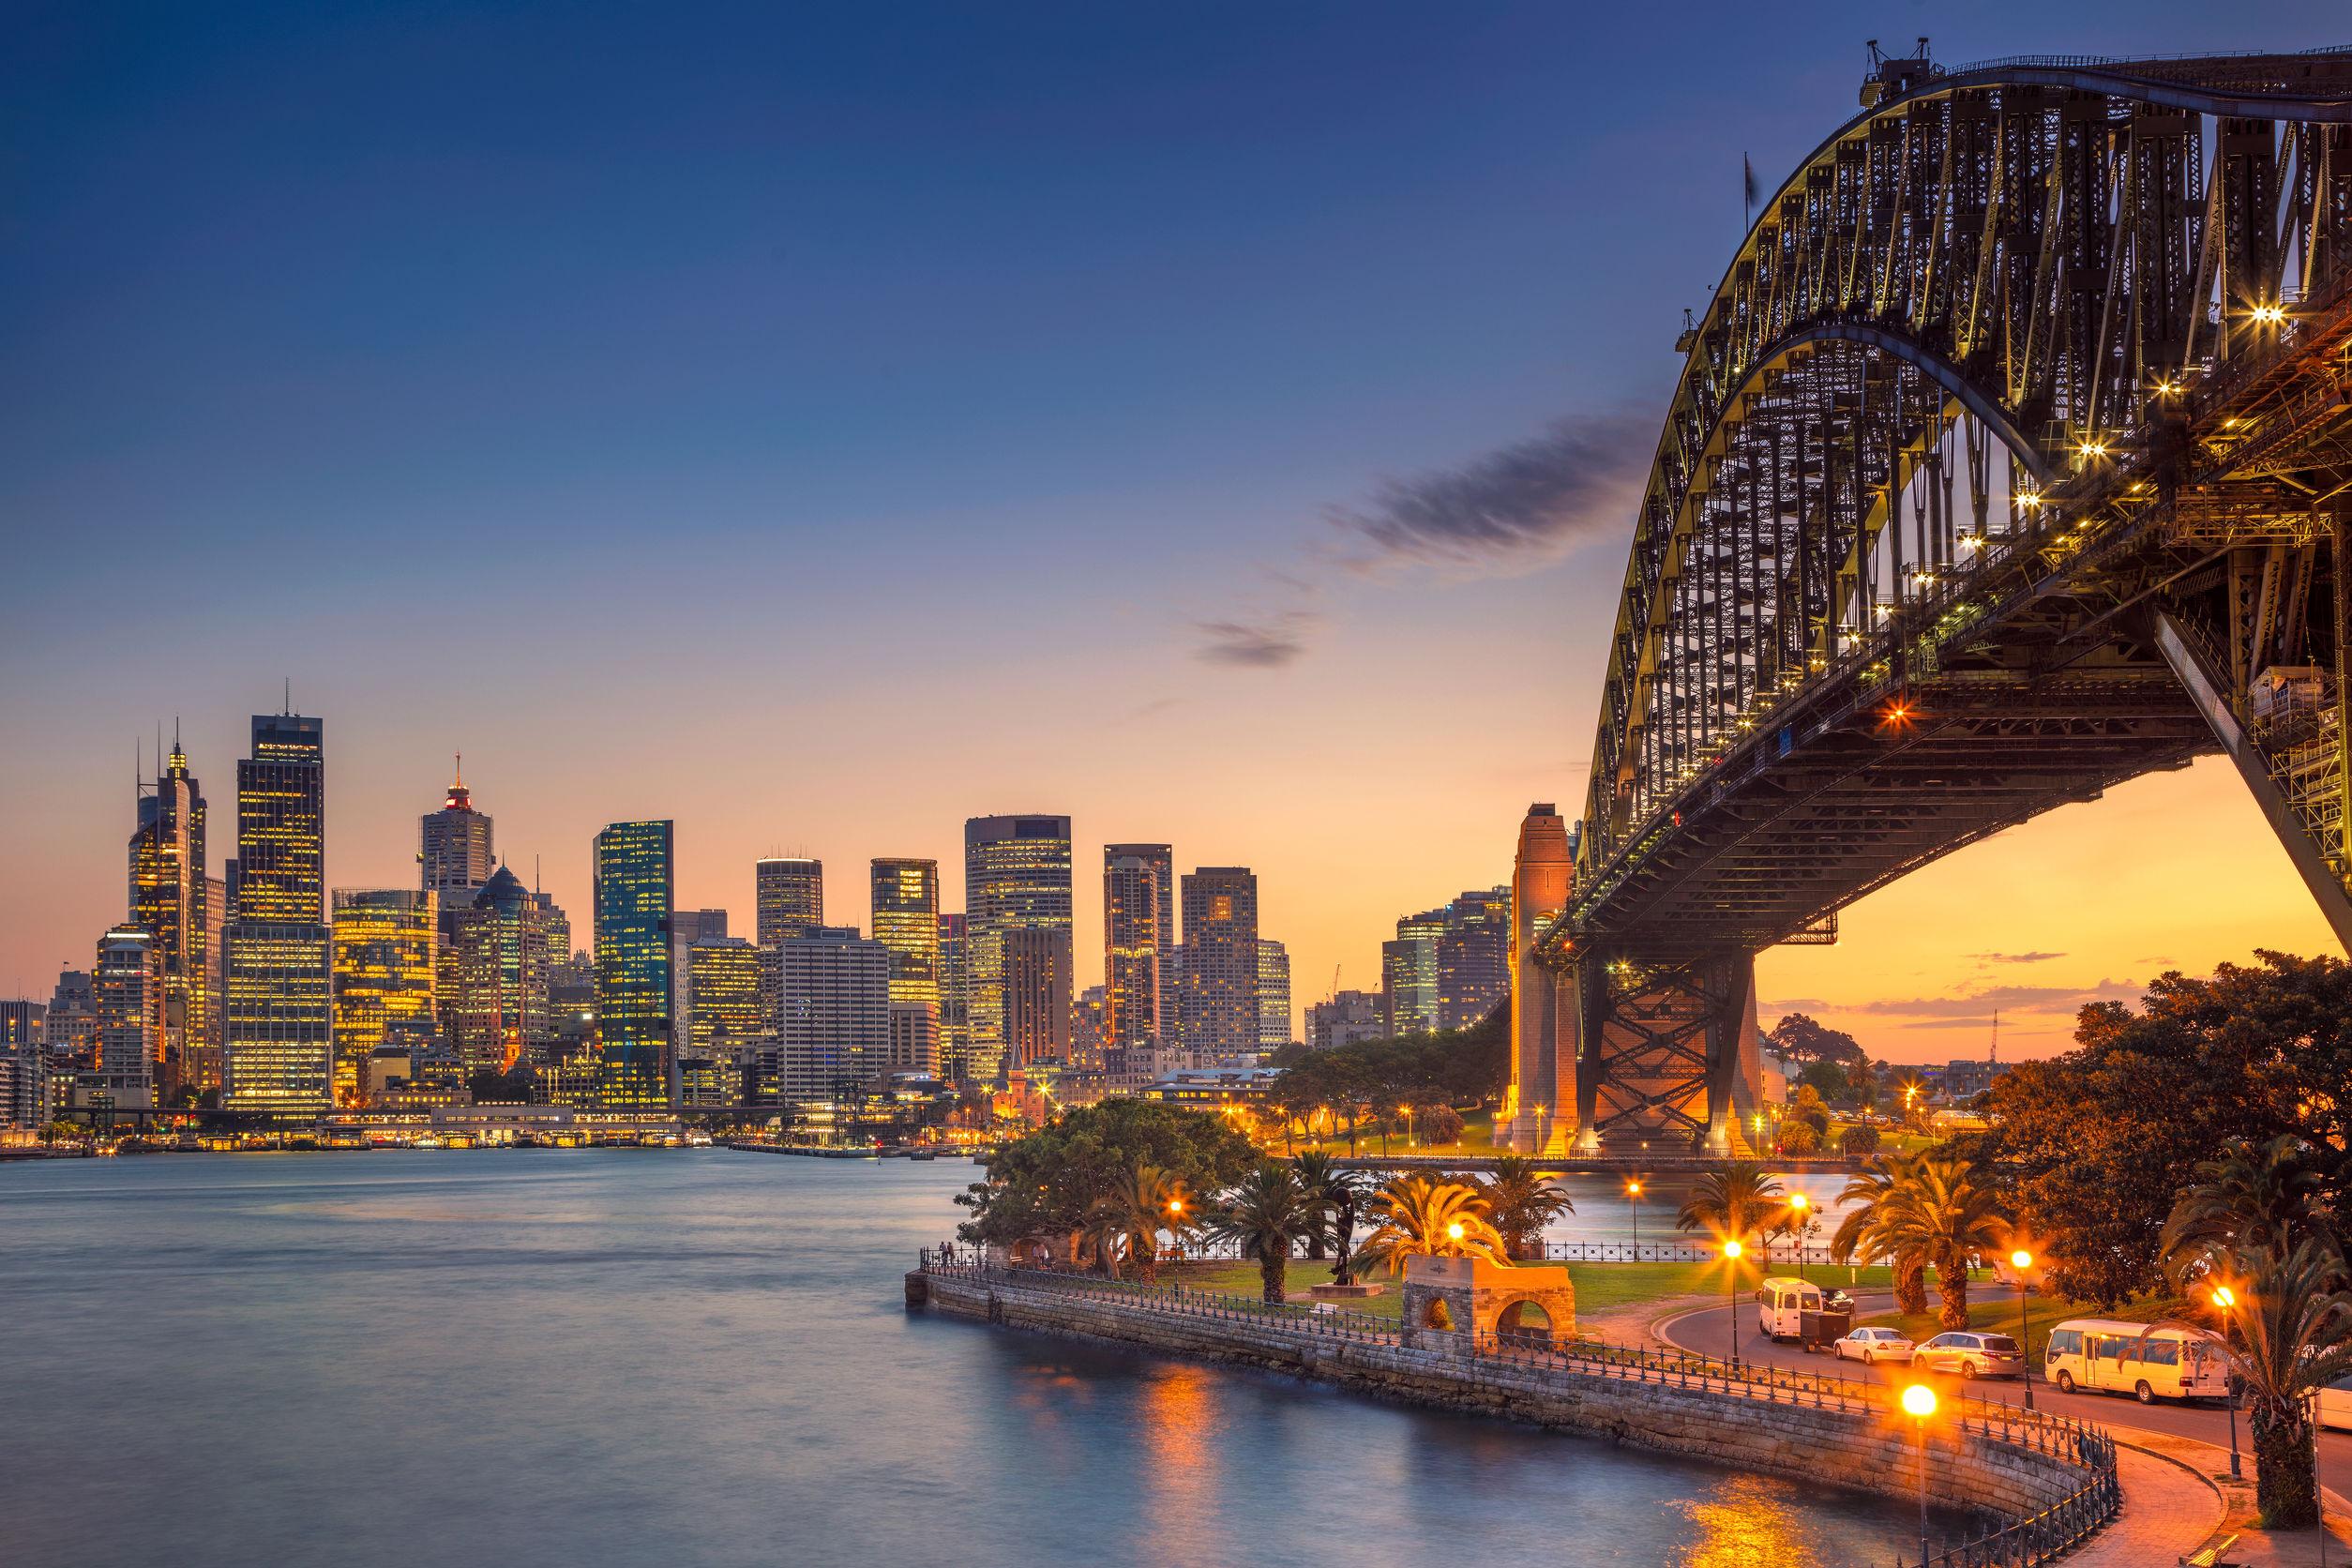 North ydney. cityscape image of sydney, australia with harbour bridge during summer sunset.